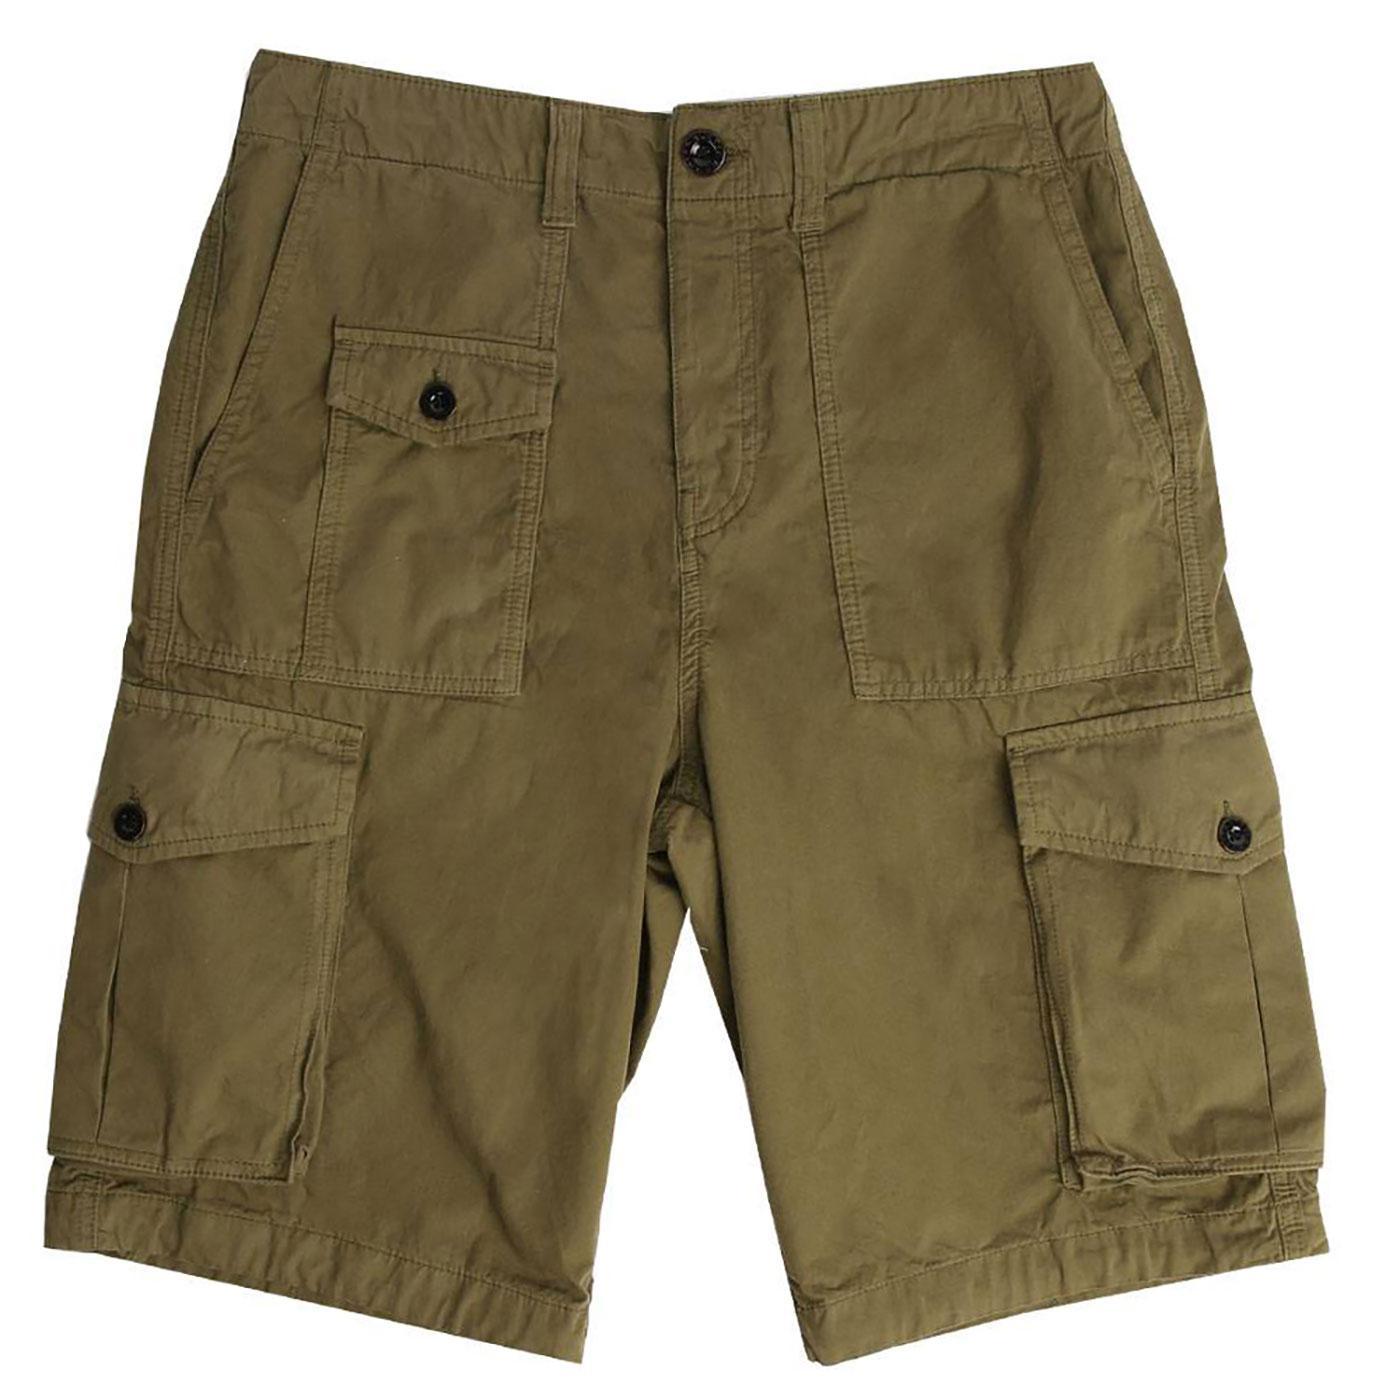 PRETTY GREEN Retro Twill Military Cargo Shorts K